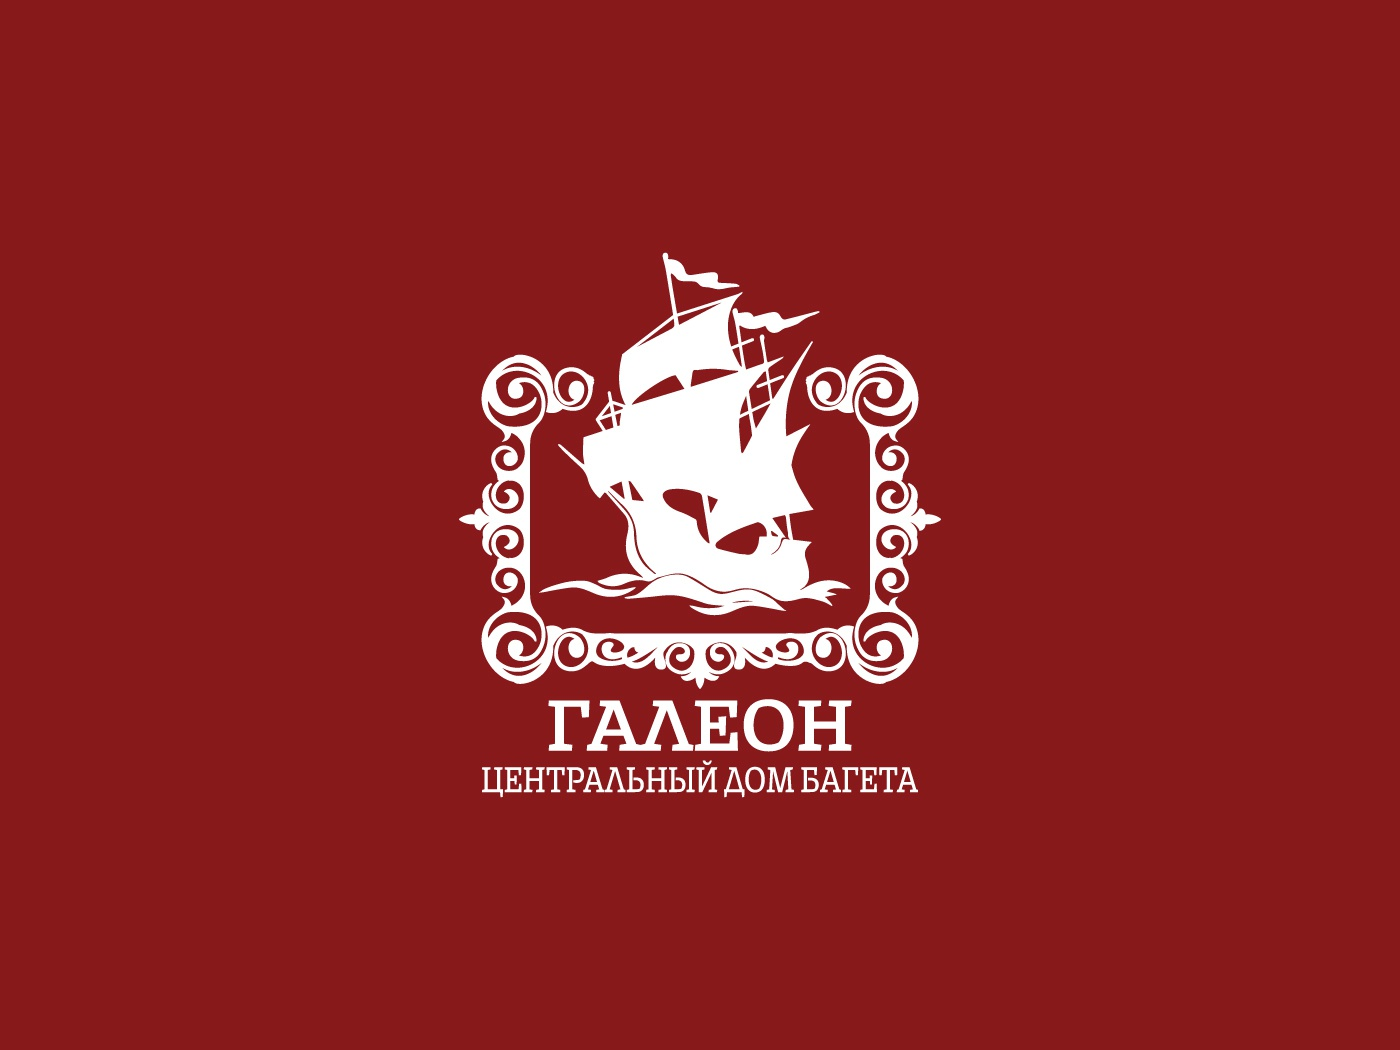 Галеон / Galleon art picture картины рамки workshop мастерская branding логотип багет лого logo photo frames paint baguette